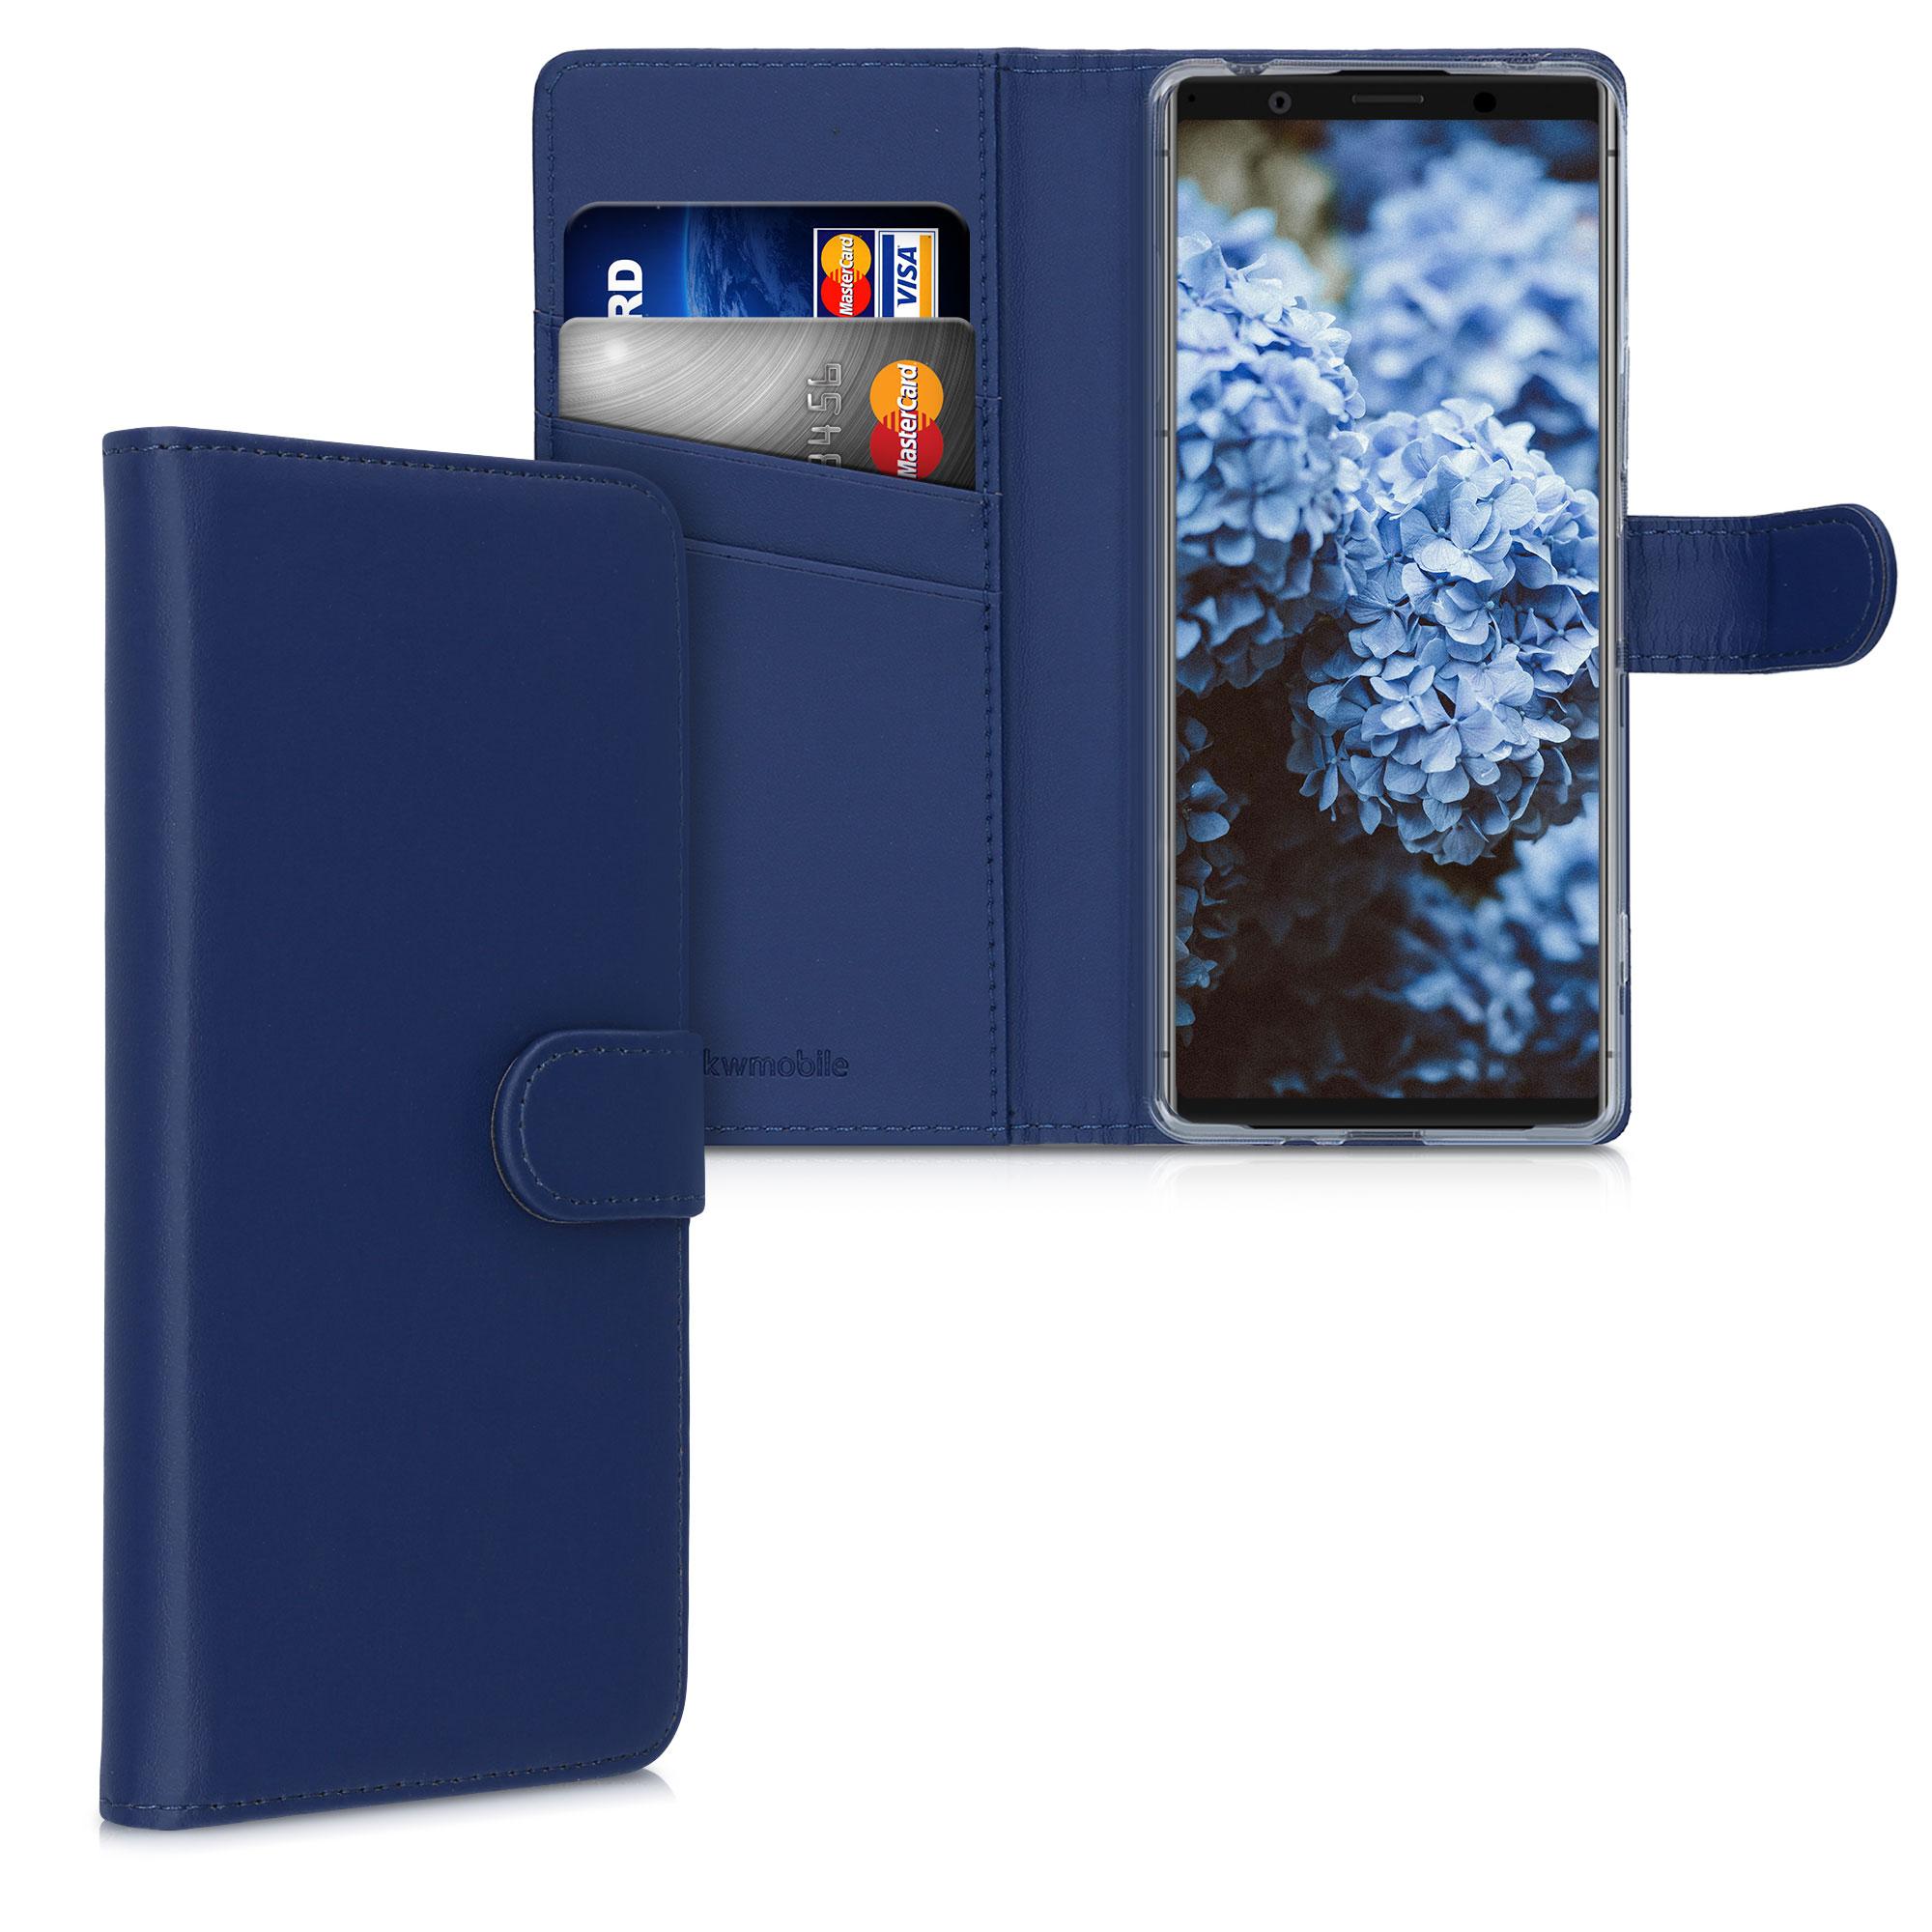 Kožené pouzdro   obal pro Sony Xperia 1 II - tmavě modré